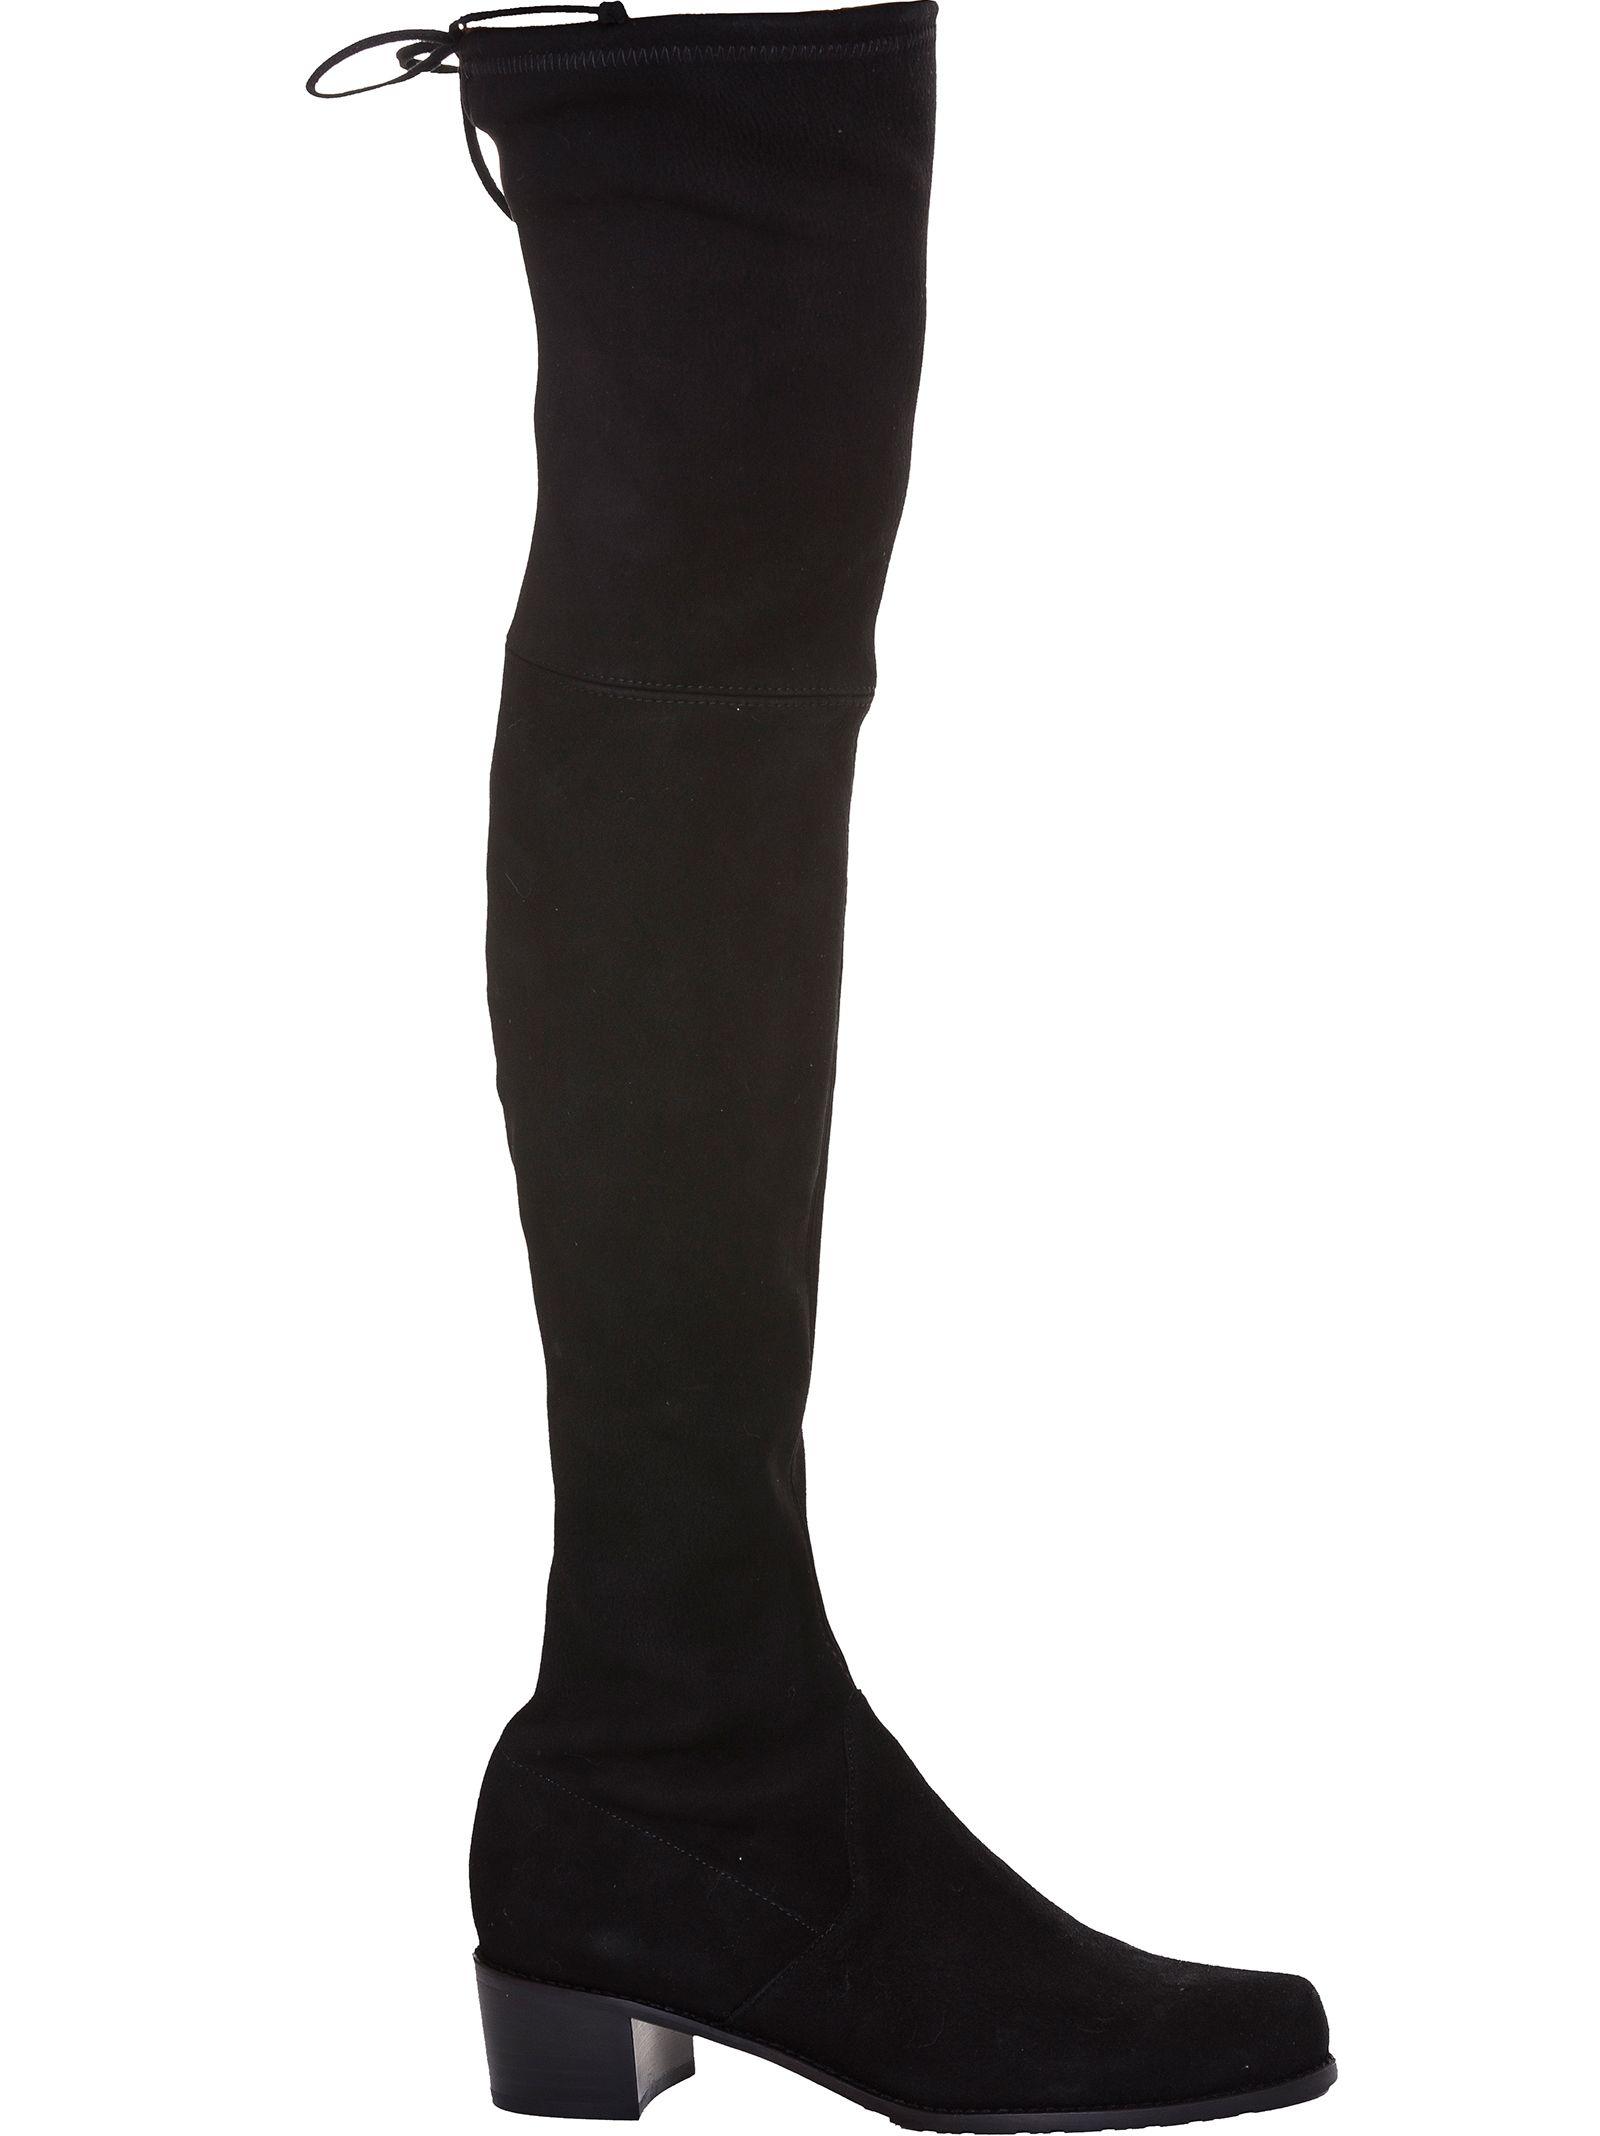 Midland Suede Boots, Nero